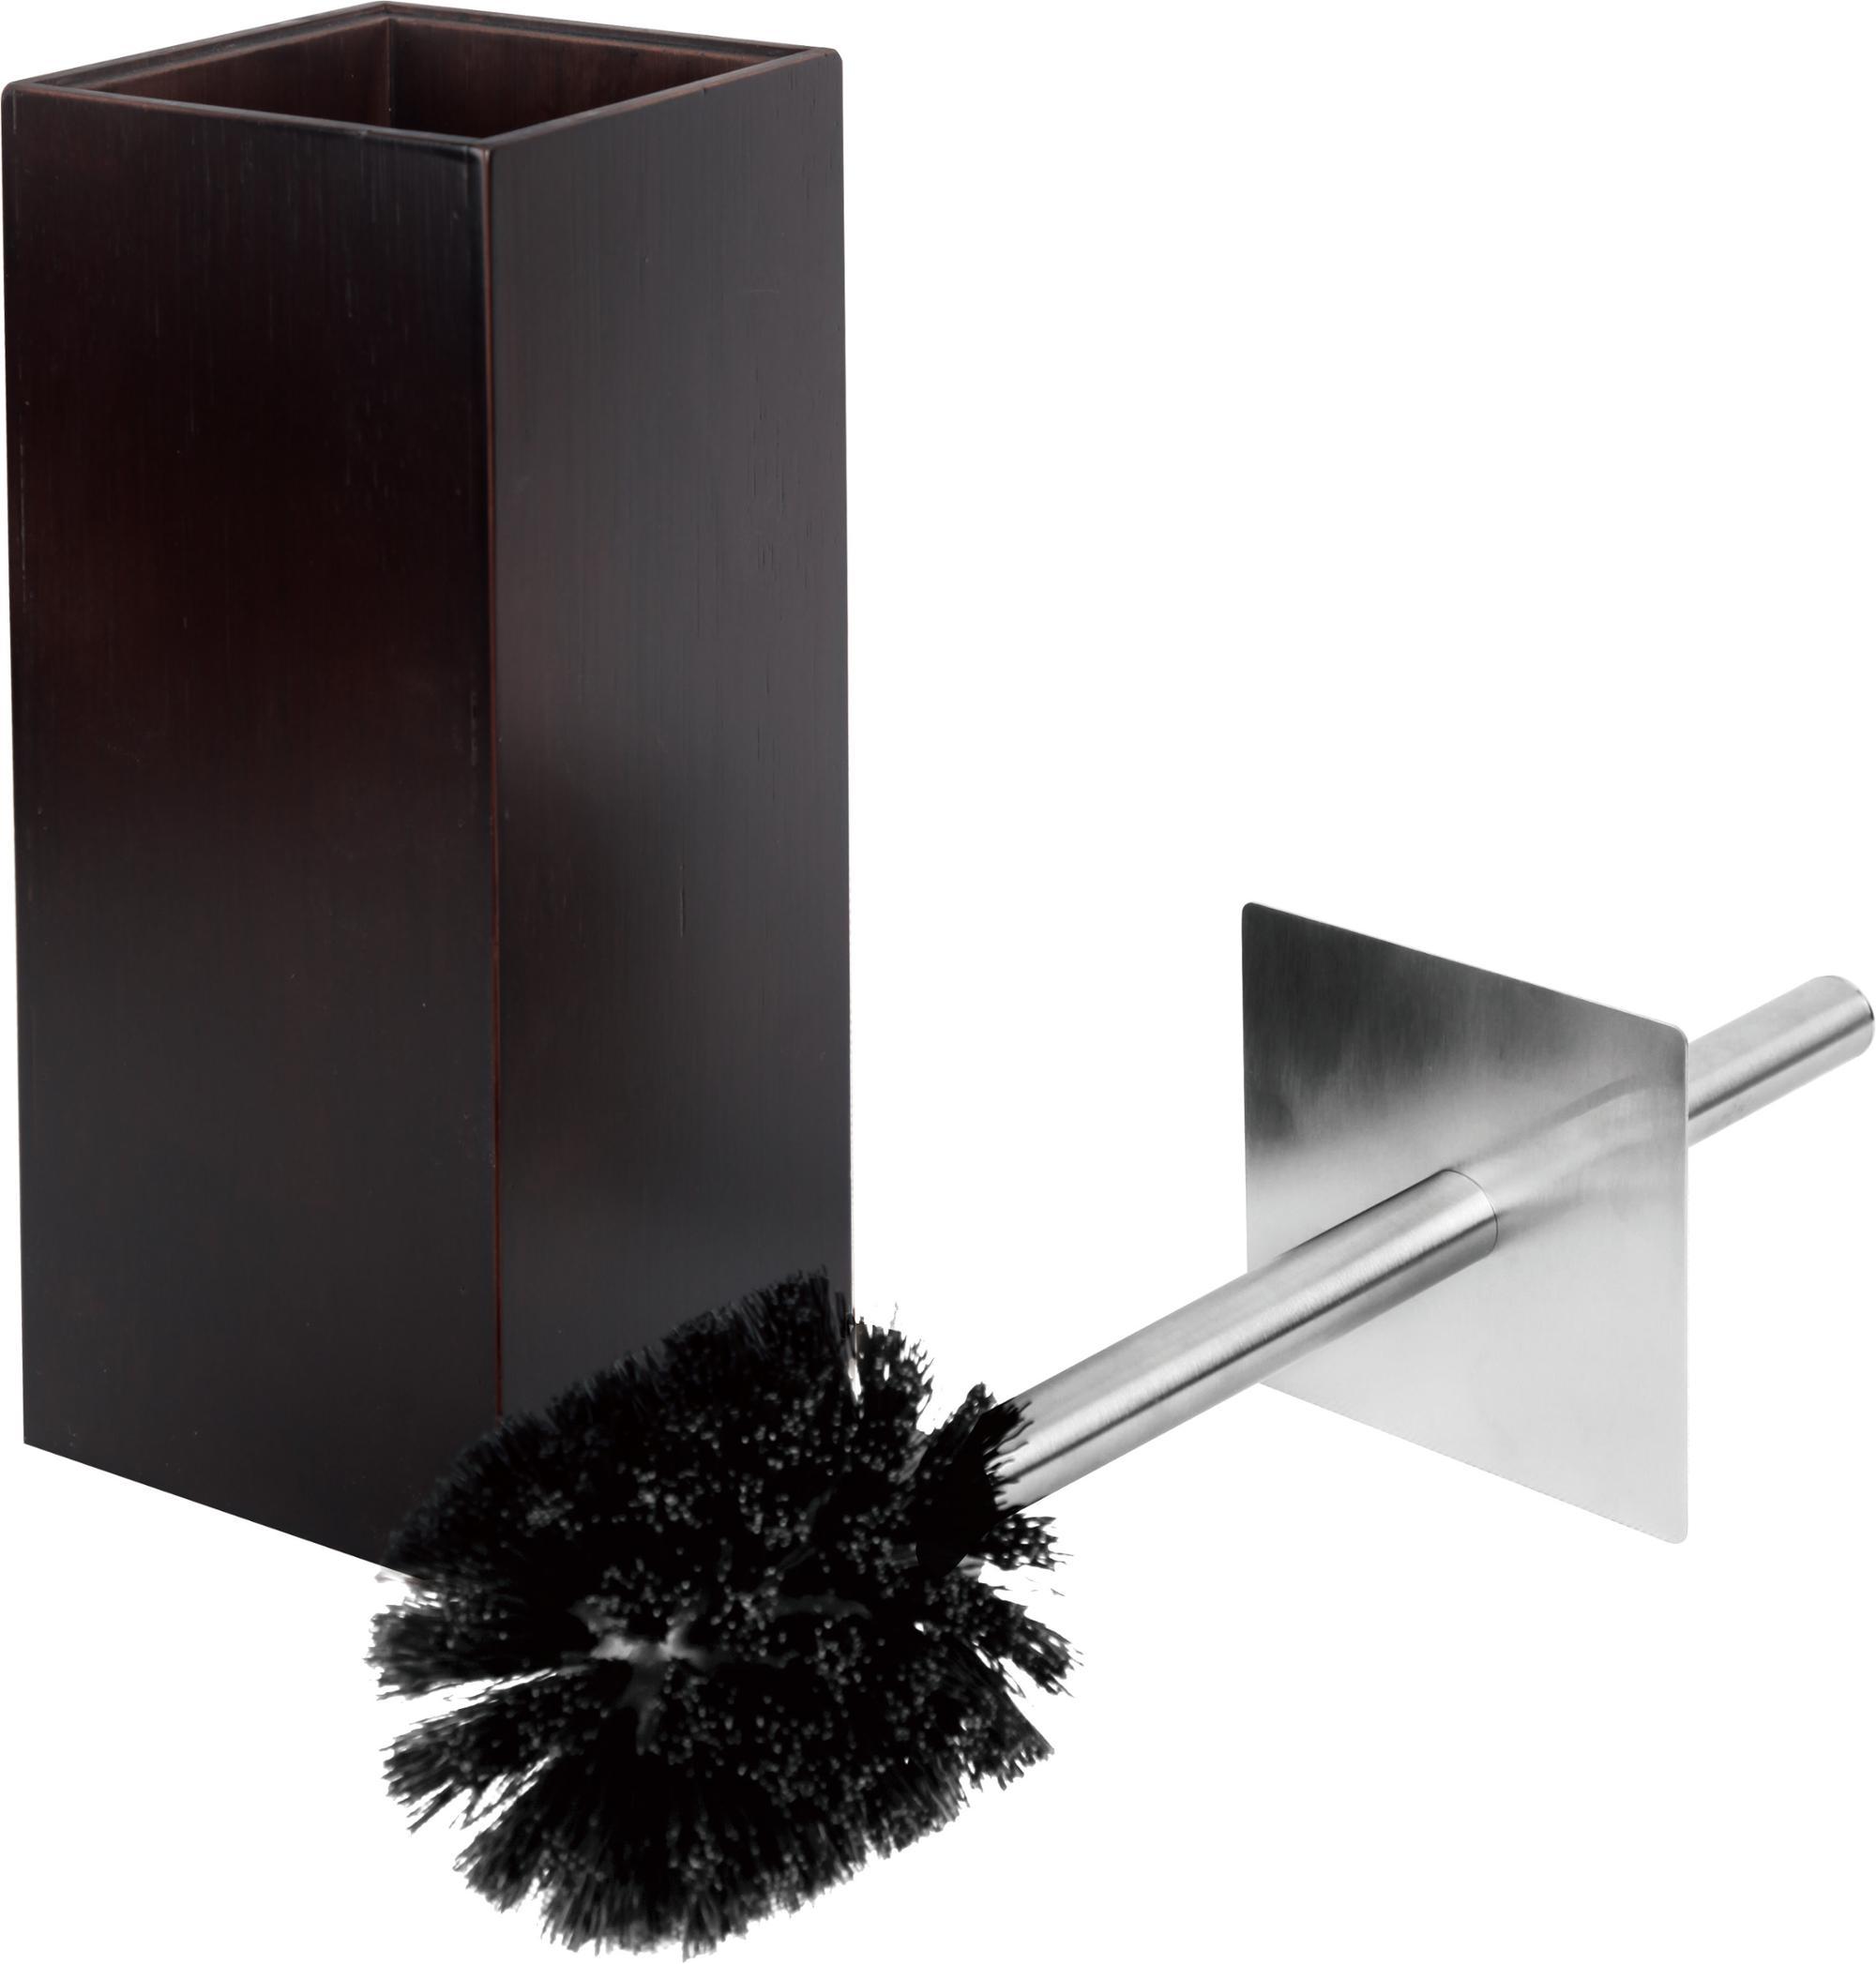 bamboo bathroom accessories 7 piece set - buy bathroom accessories set,bathroom accessories